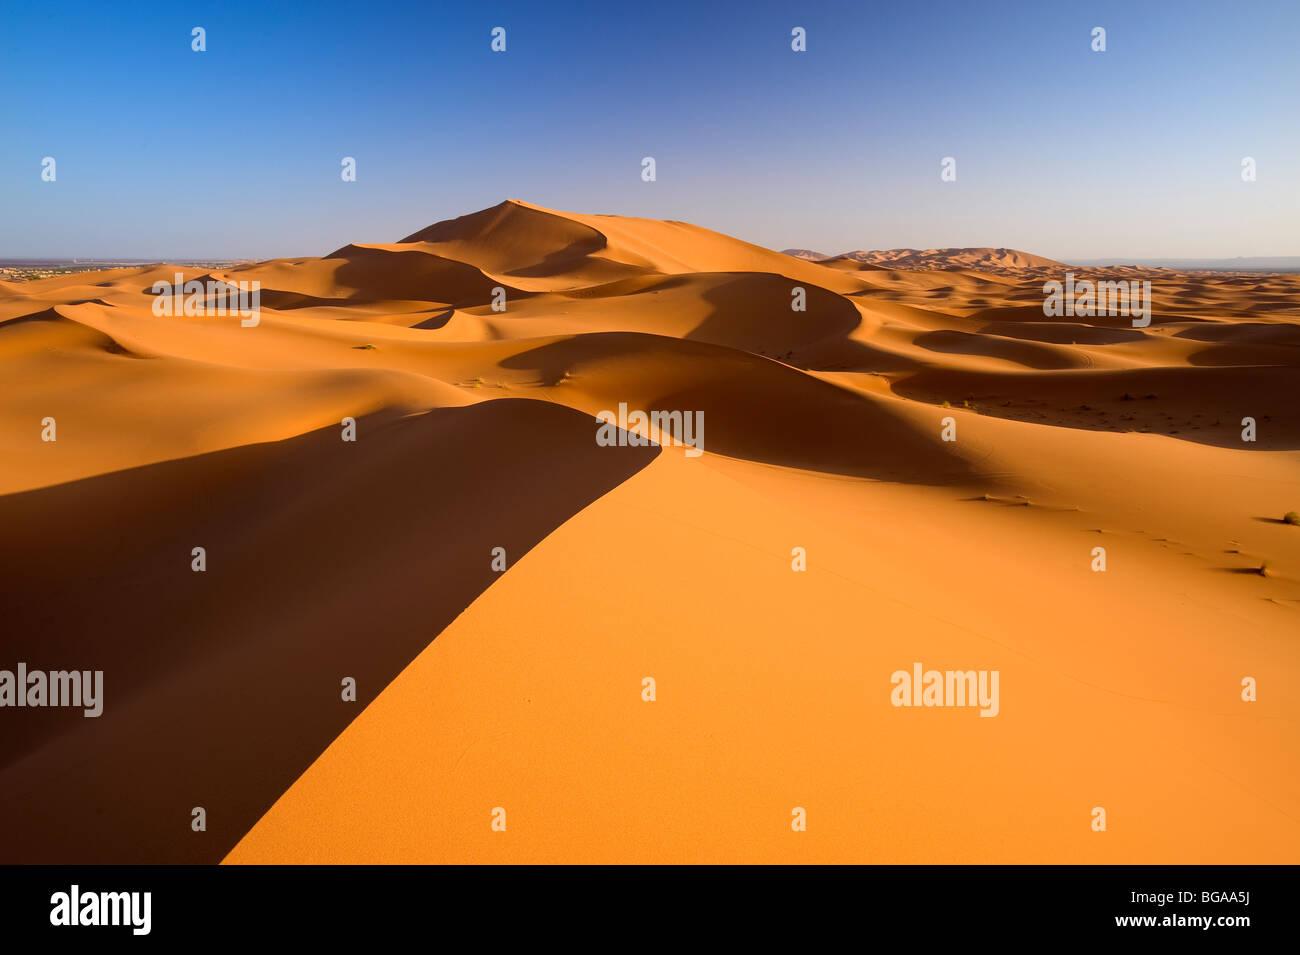 Erg Chebbi, Merzouga, valle de Ziz, el desierto del Sahara, Marruecos Imagen De Stock